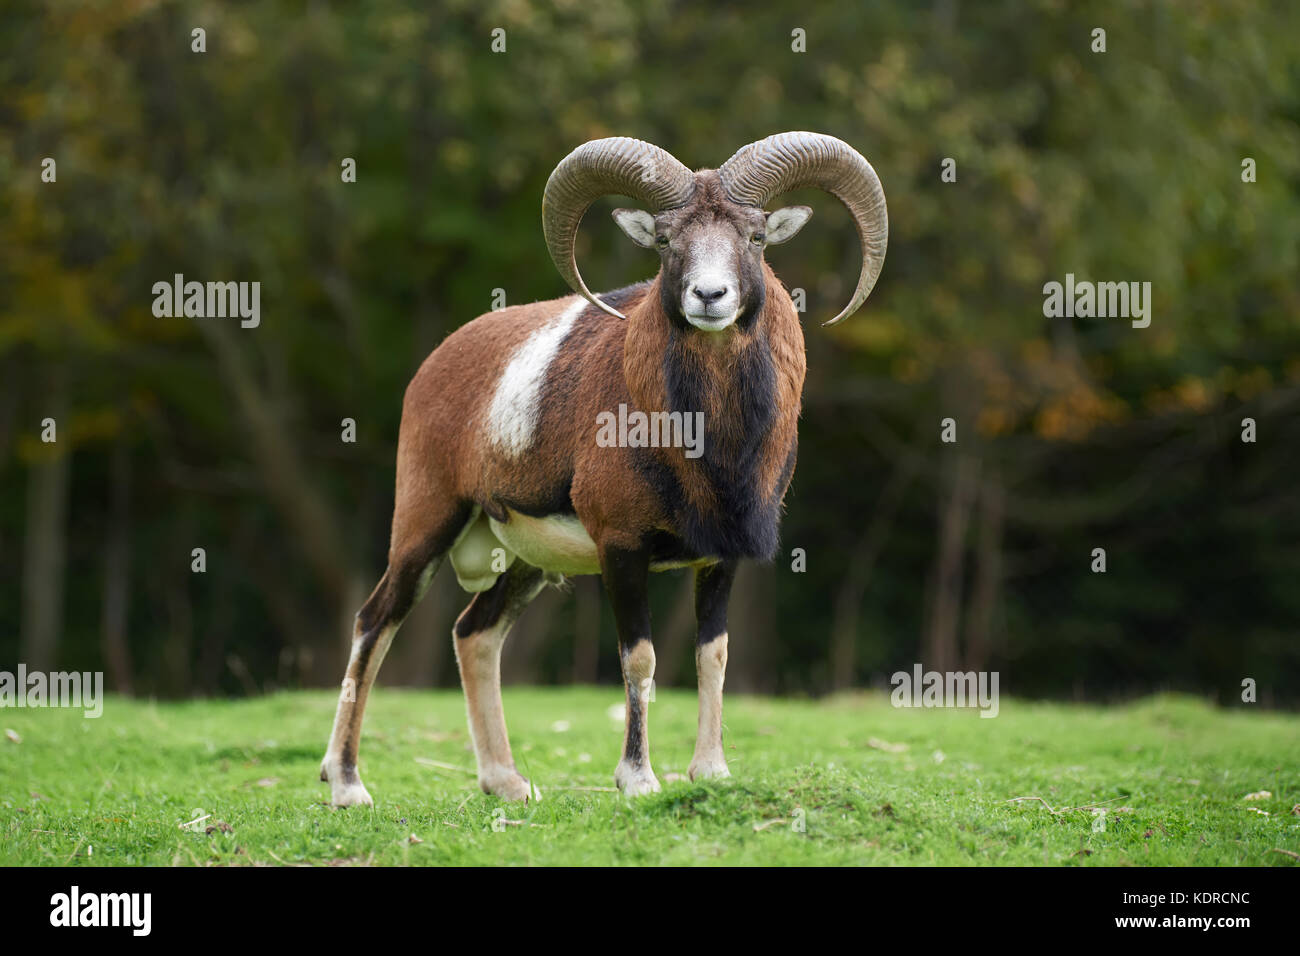 Big european moufflon in the nature habitat - Stock Image